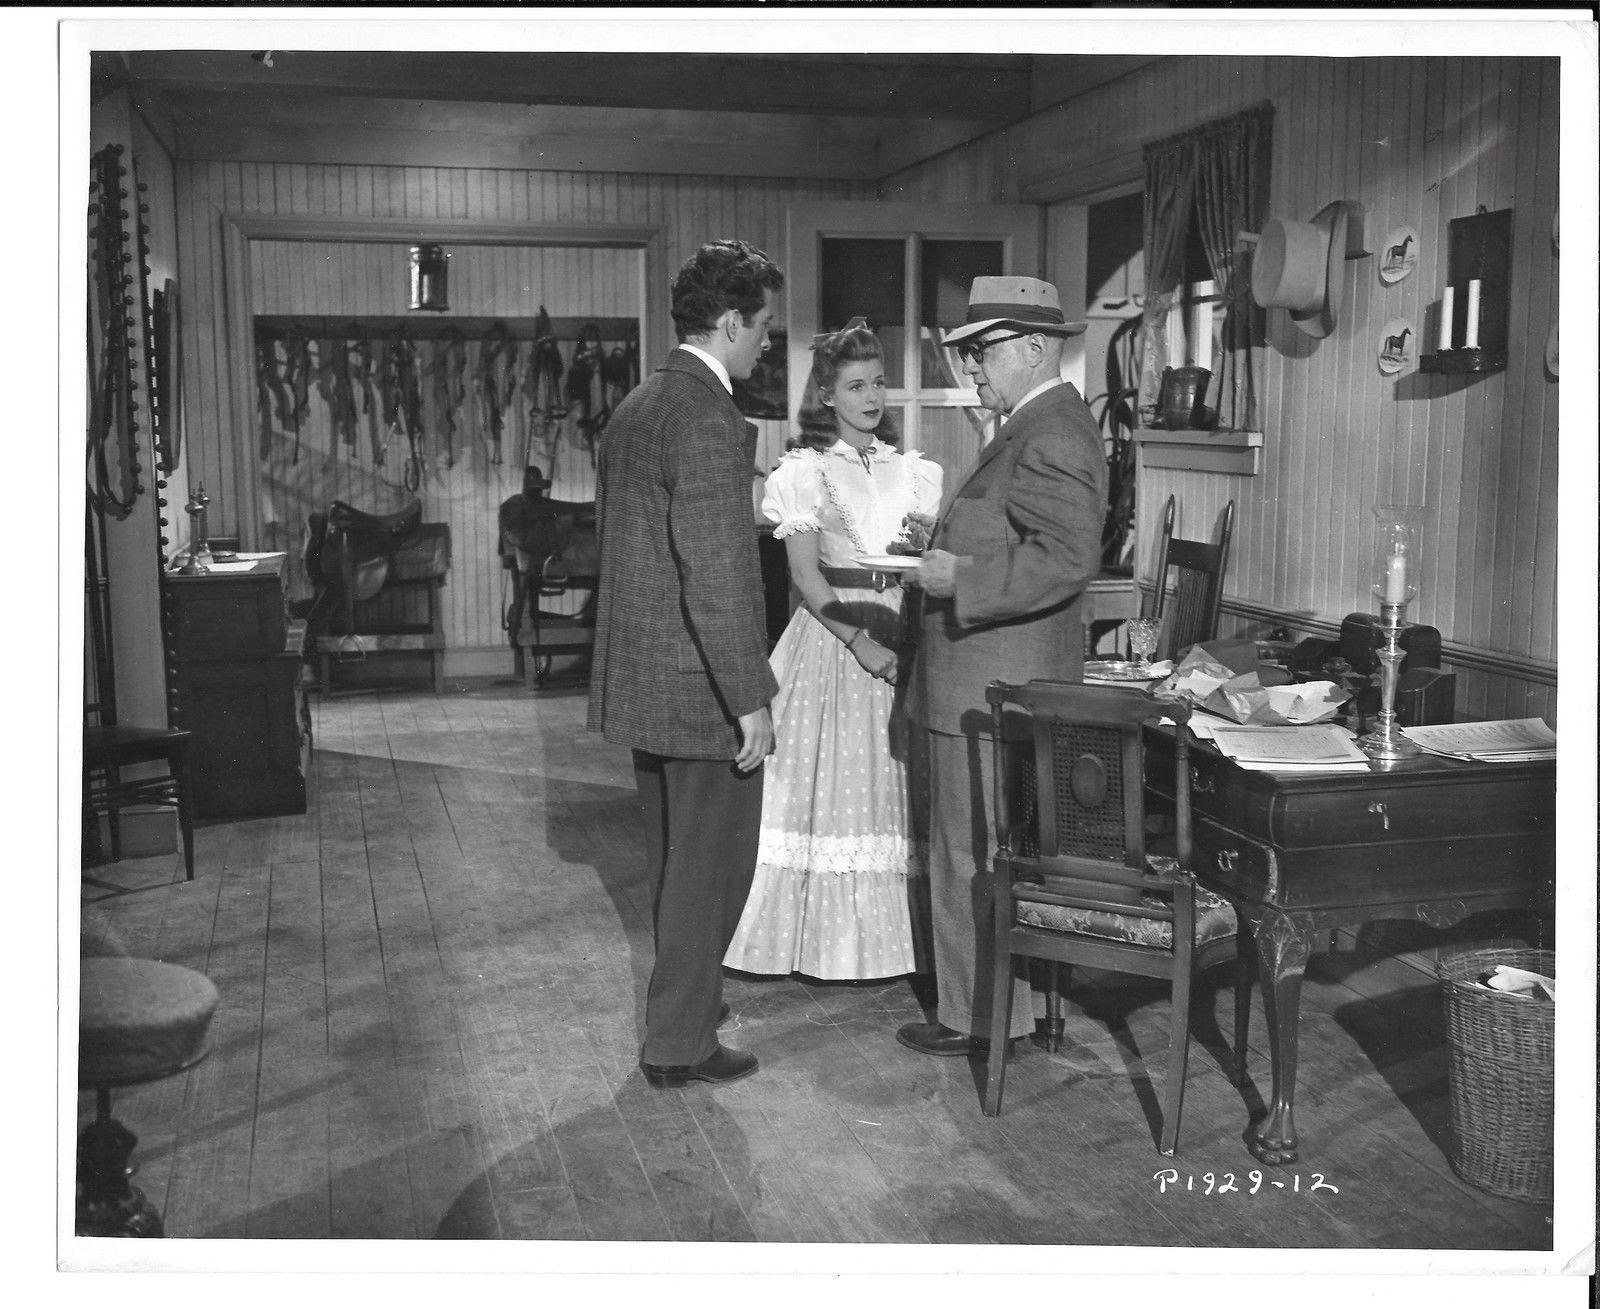 Eileen Christy, Allan Dwan, and Bill Shirley in I Dream of Jeanie (1952)